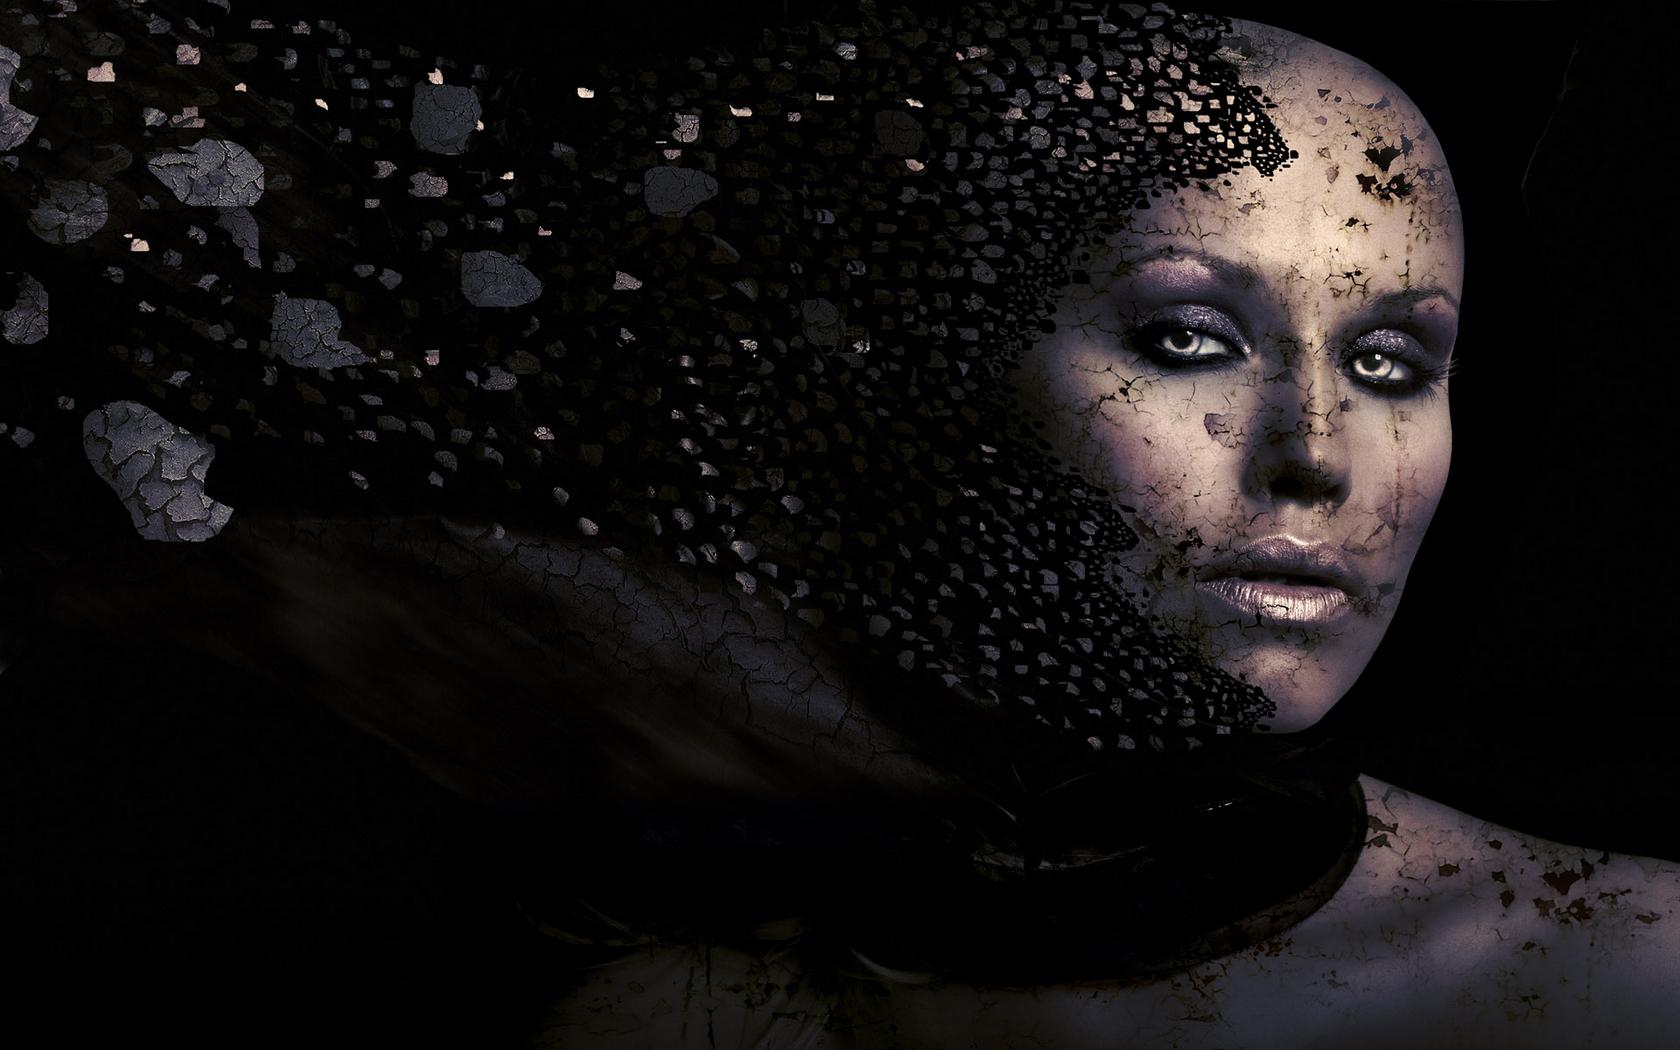 horror movie ashes image